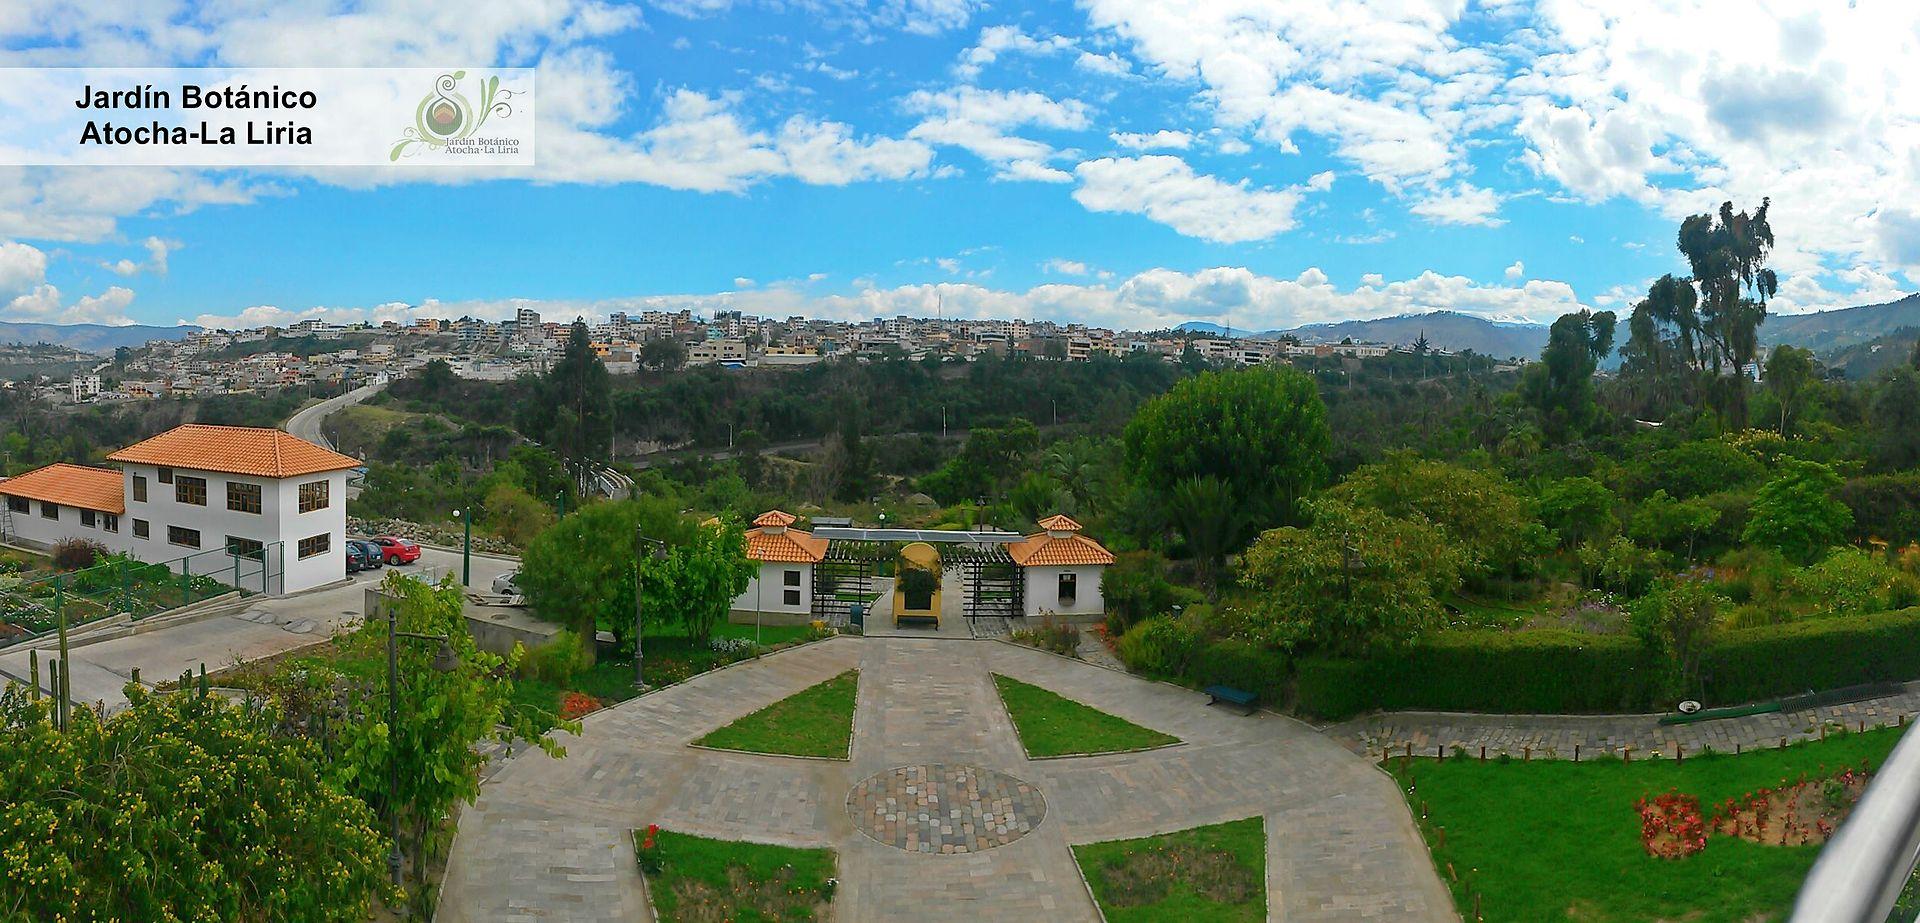 Jardín botánico  Wikipedia, la enciclopedia libre